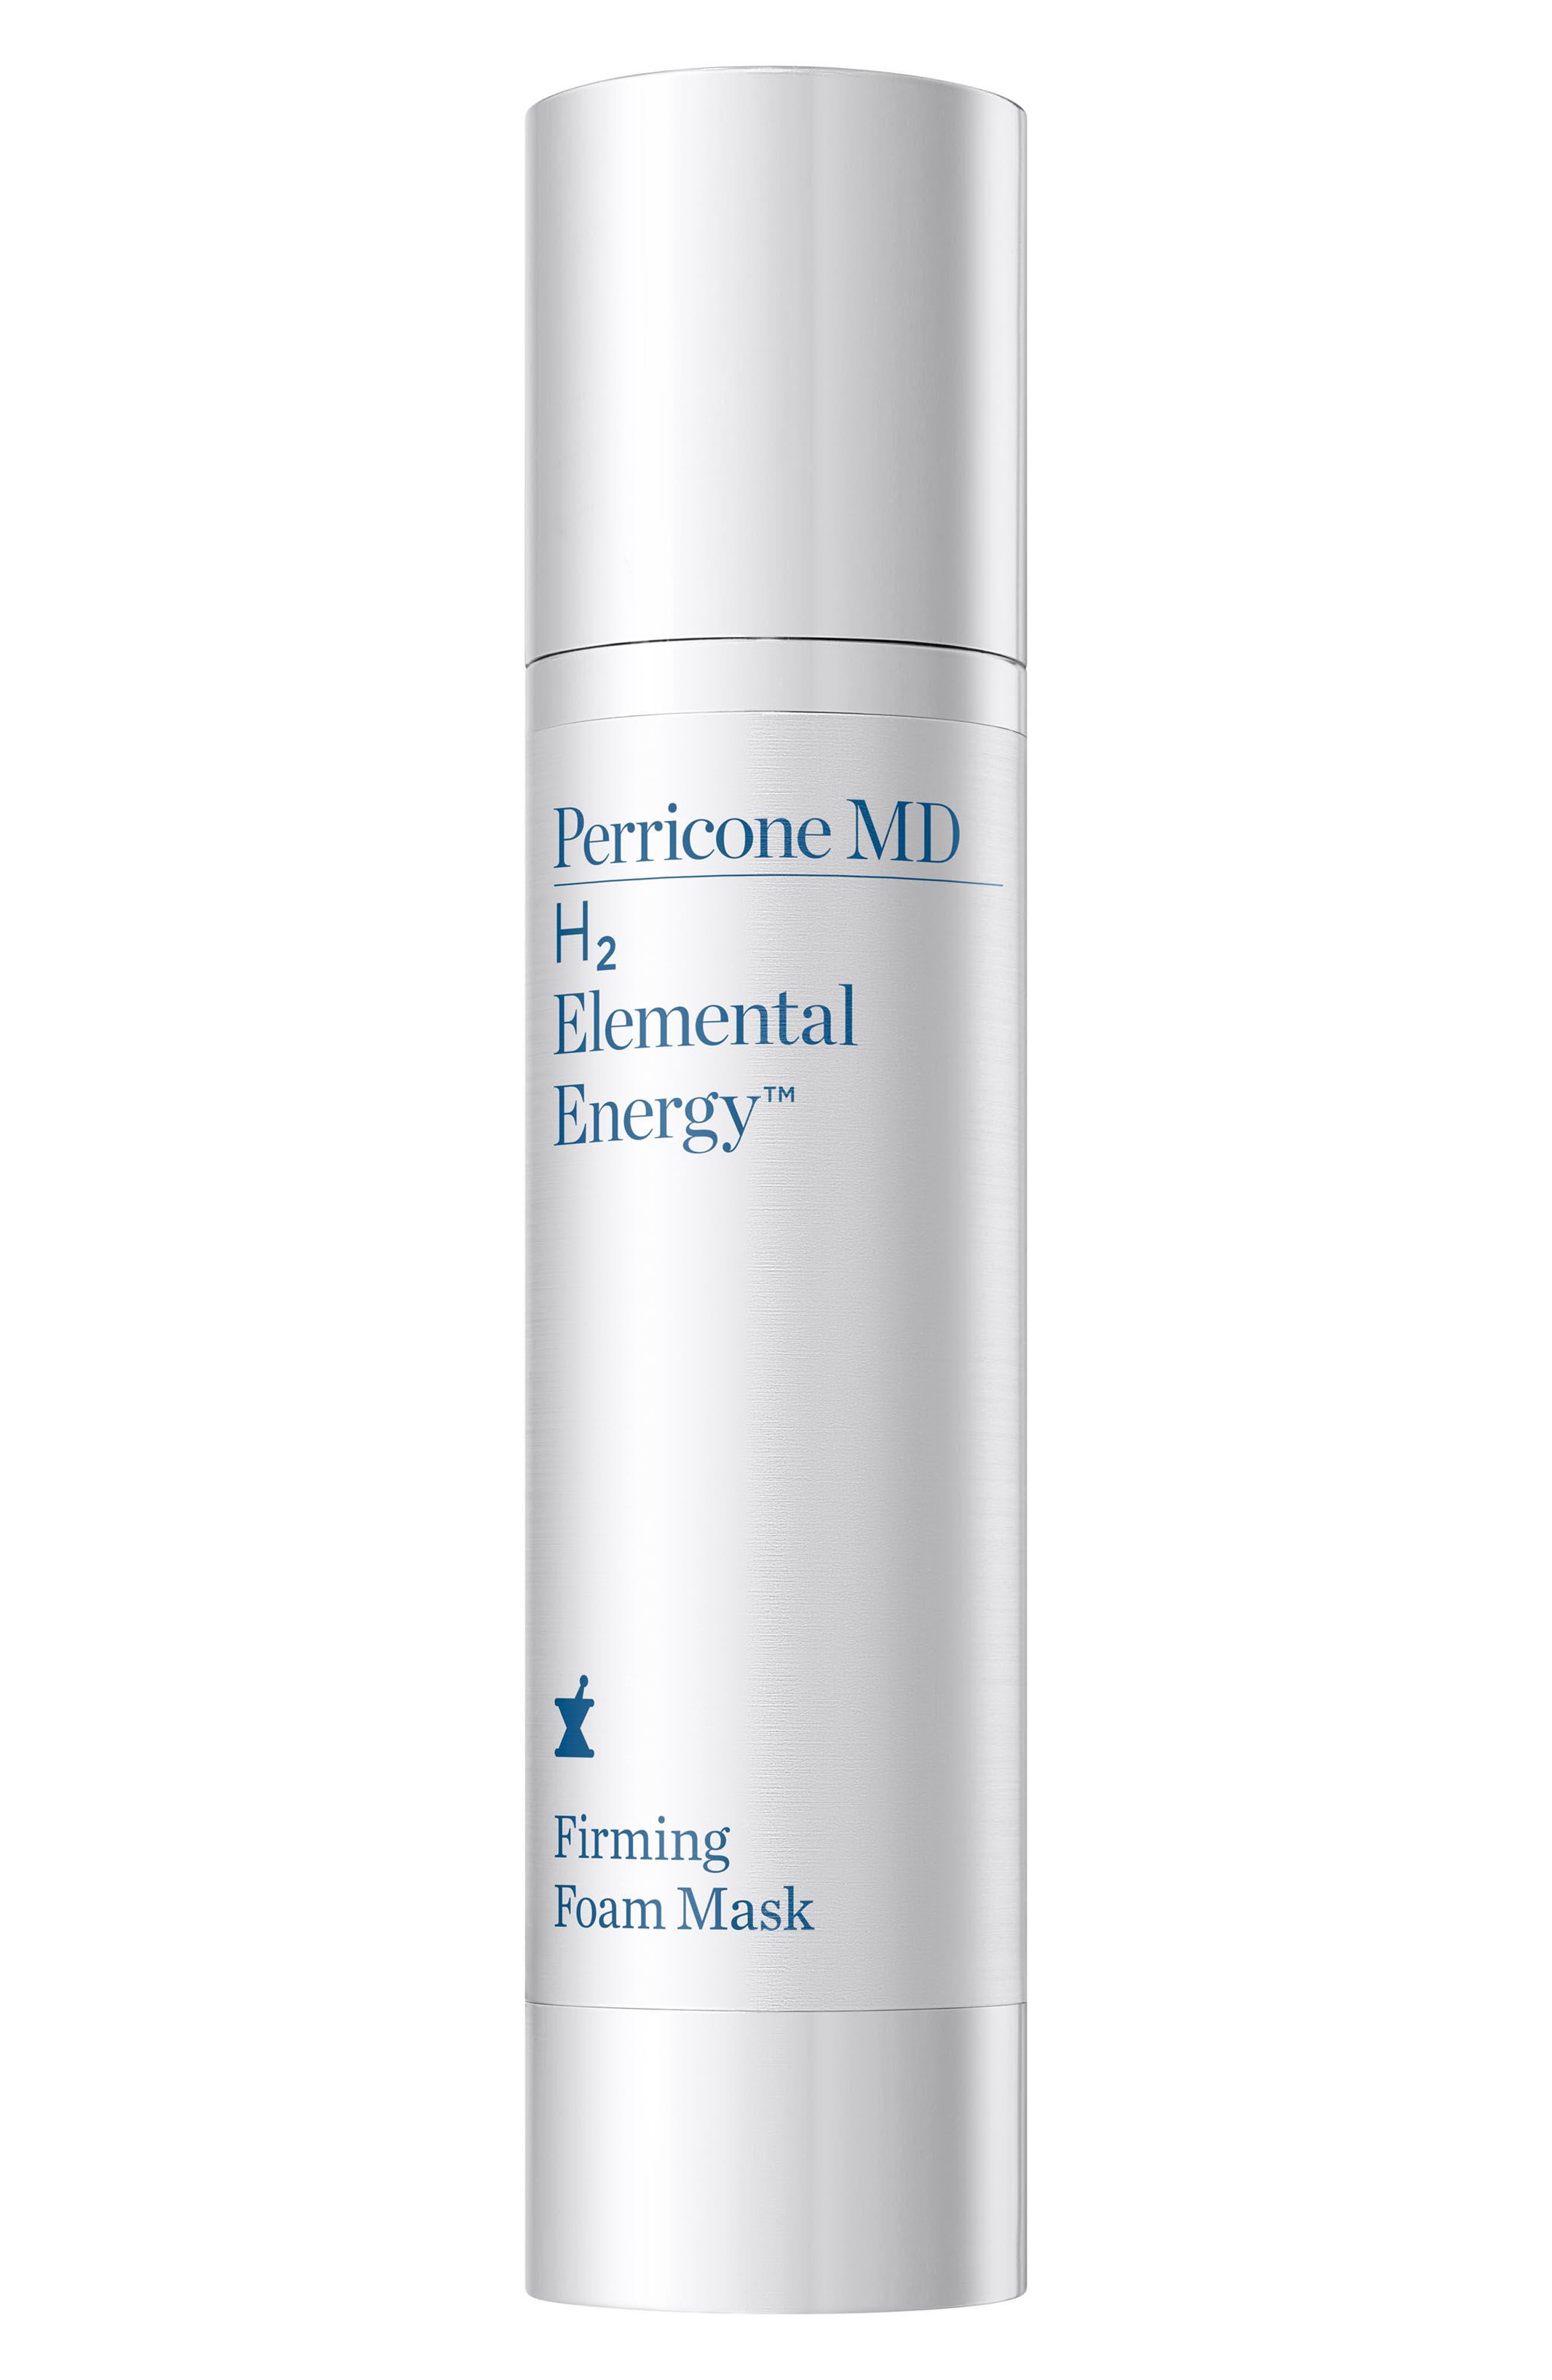 Perricone MD H2 Elemental Energy Firming Foam Mask